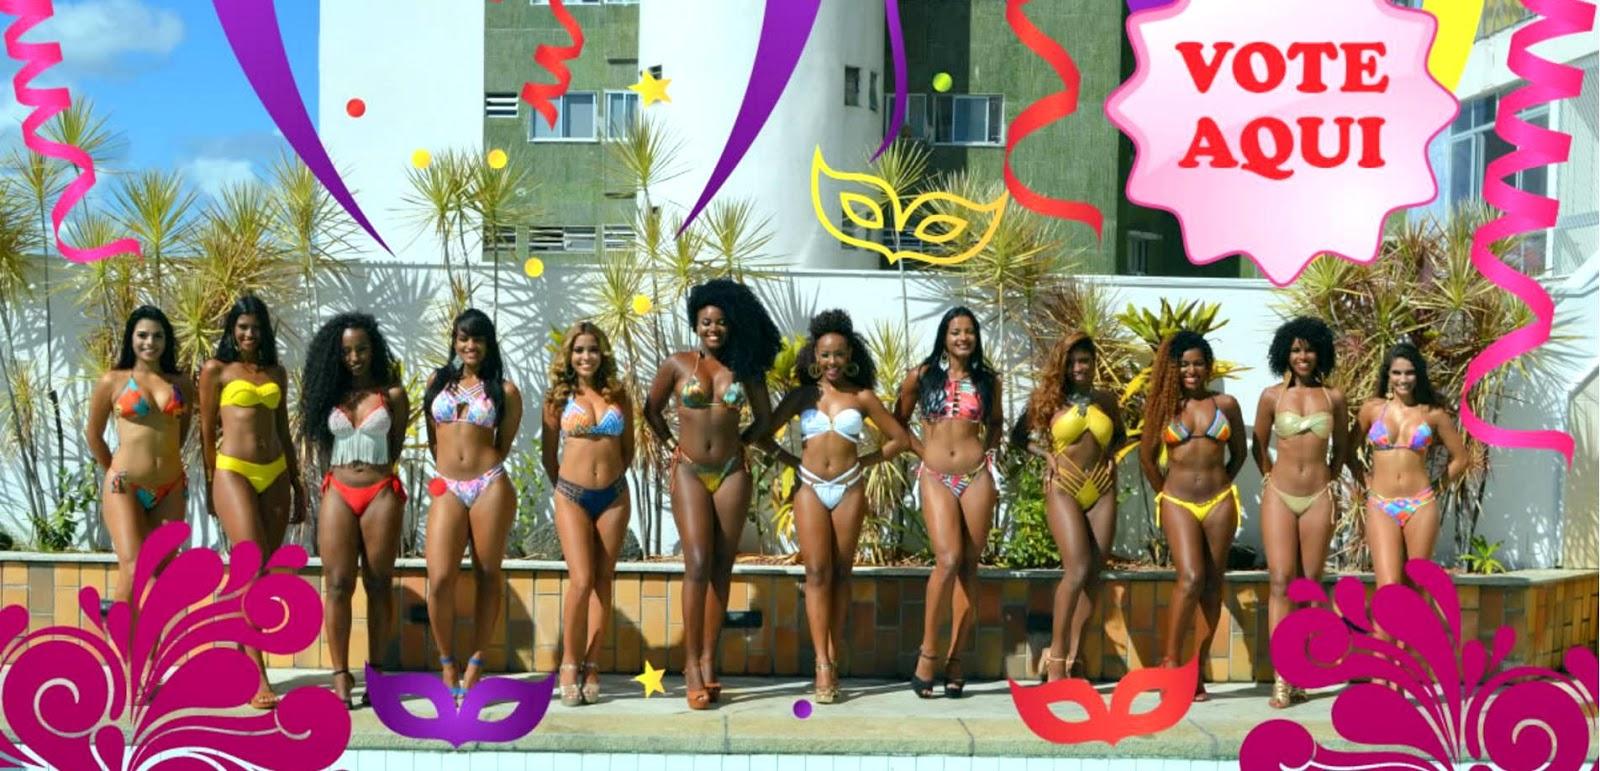 Carnaval de salvador 1